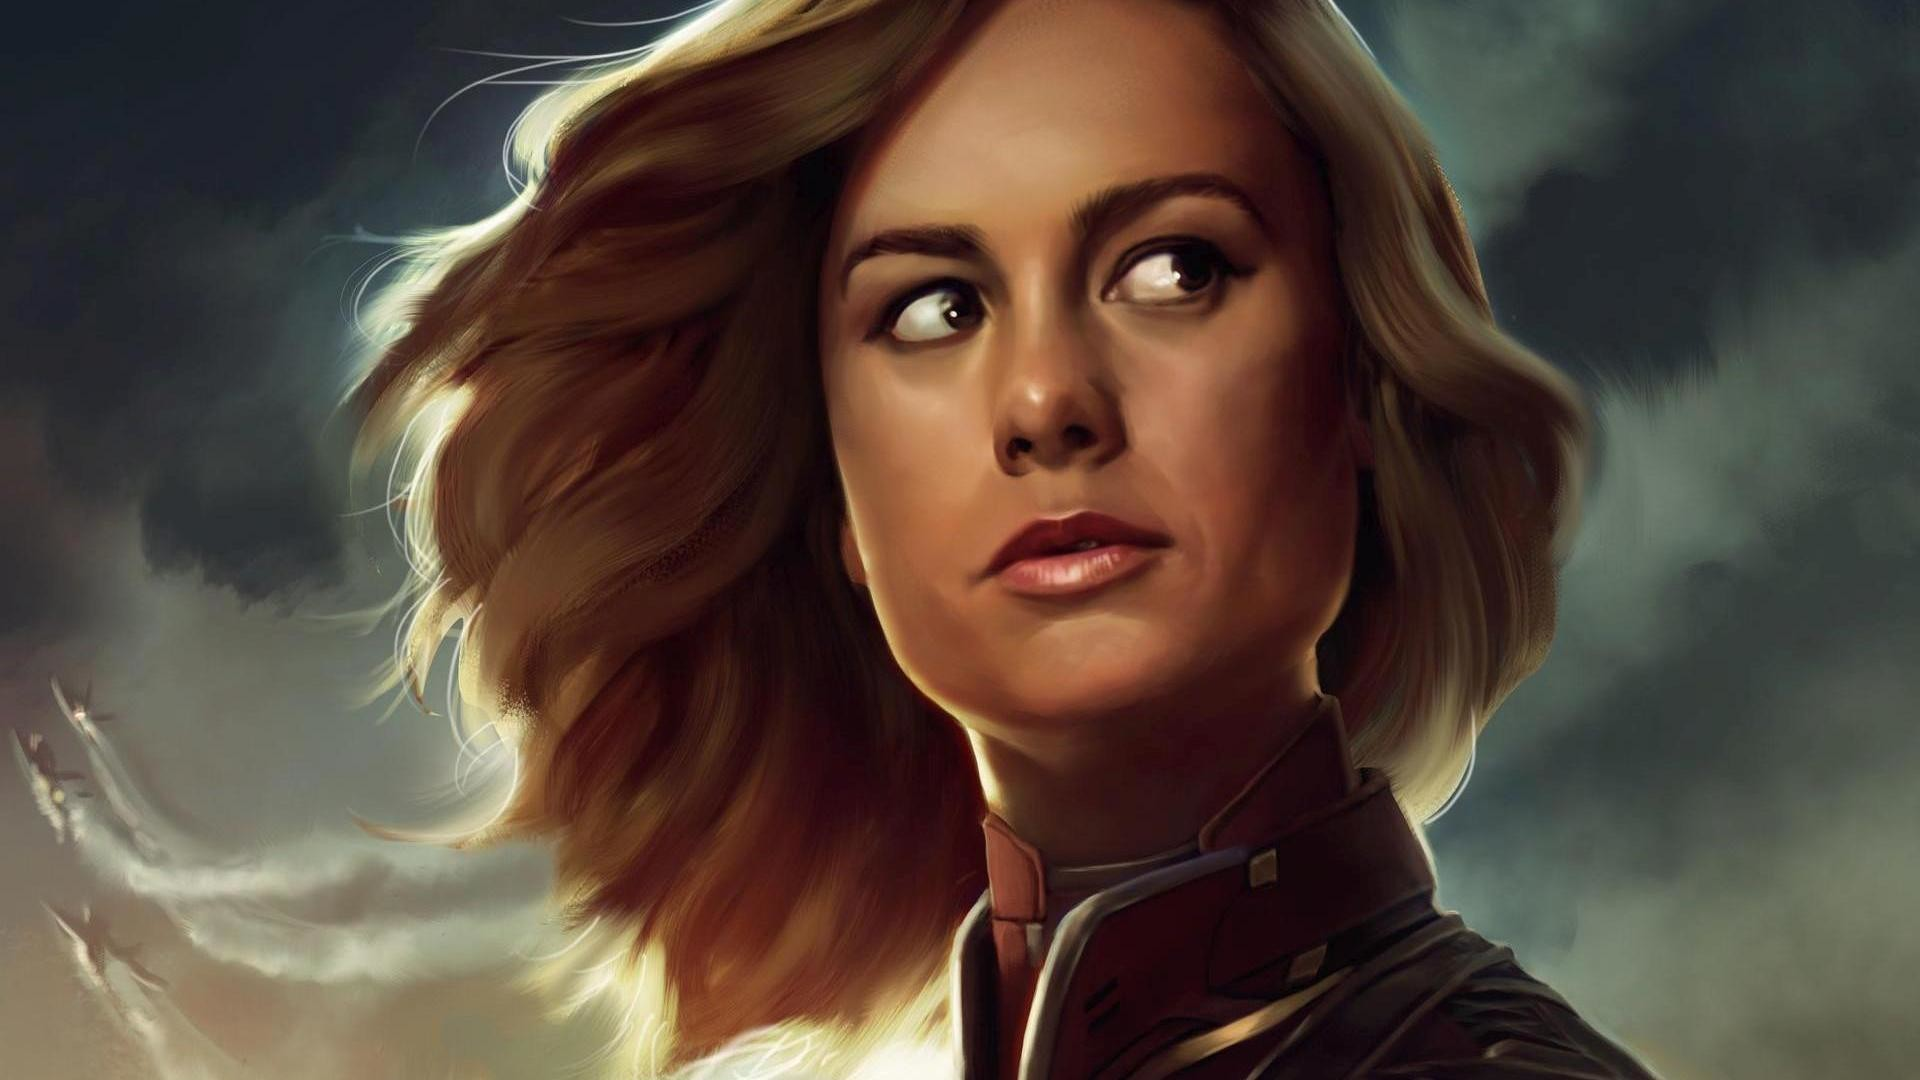 Download hd Brie Larson Captain Marvel Artwork hd Wallpaper